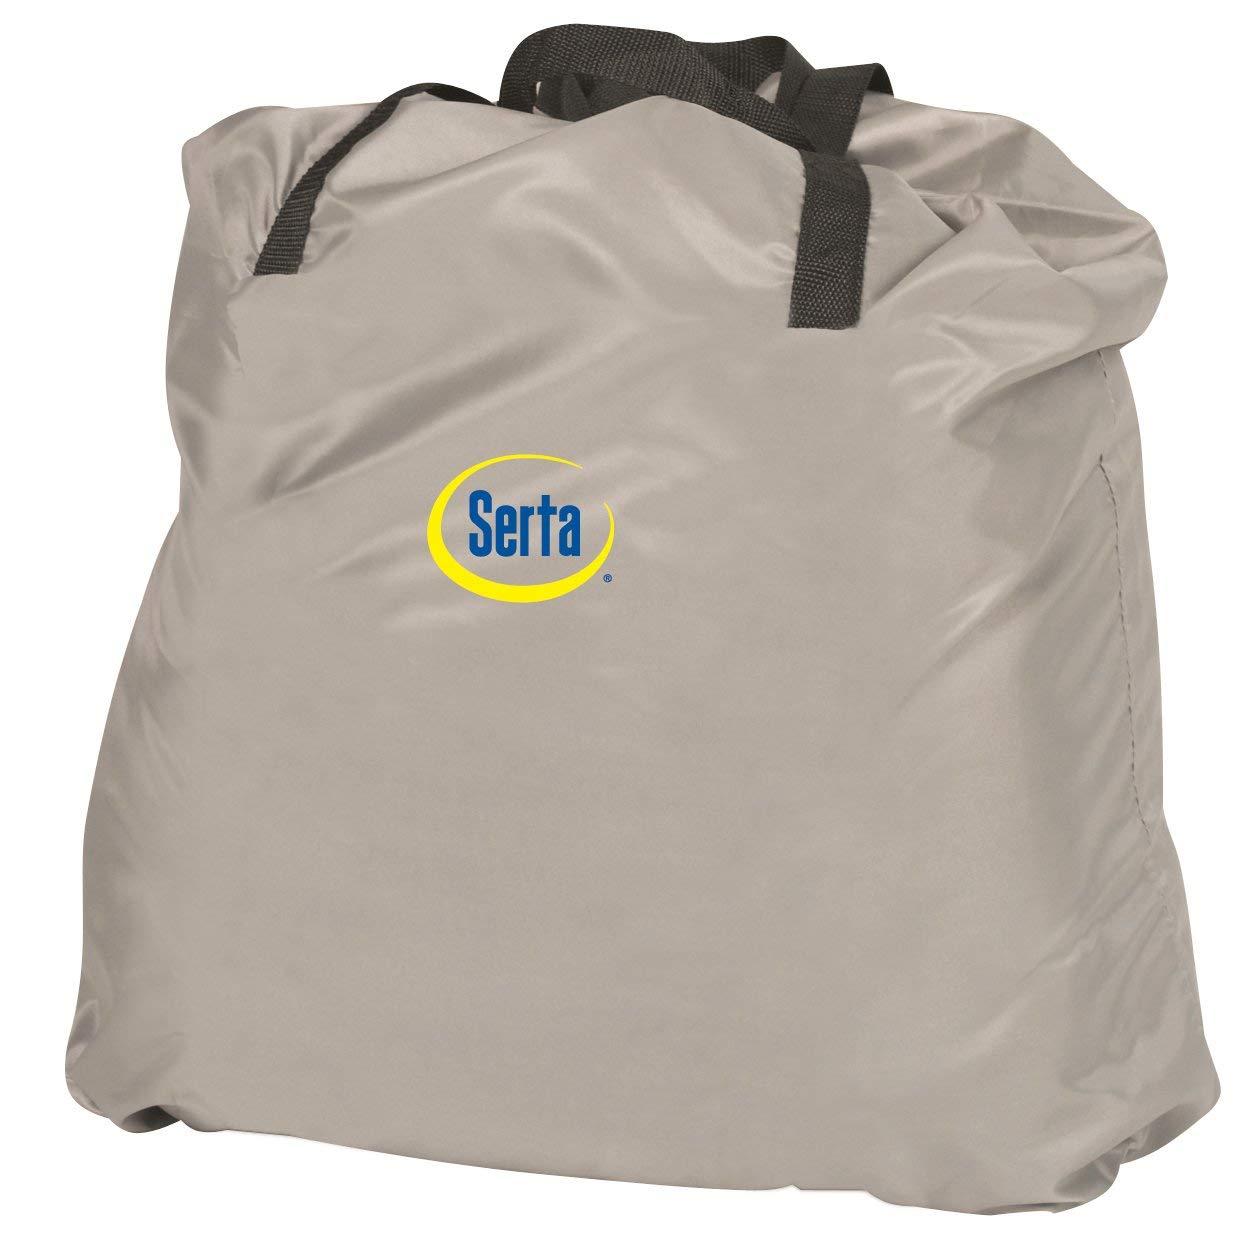 Serta Raised Air Mattress